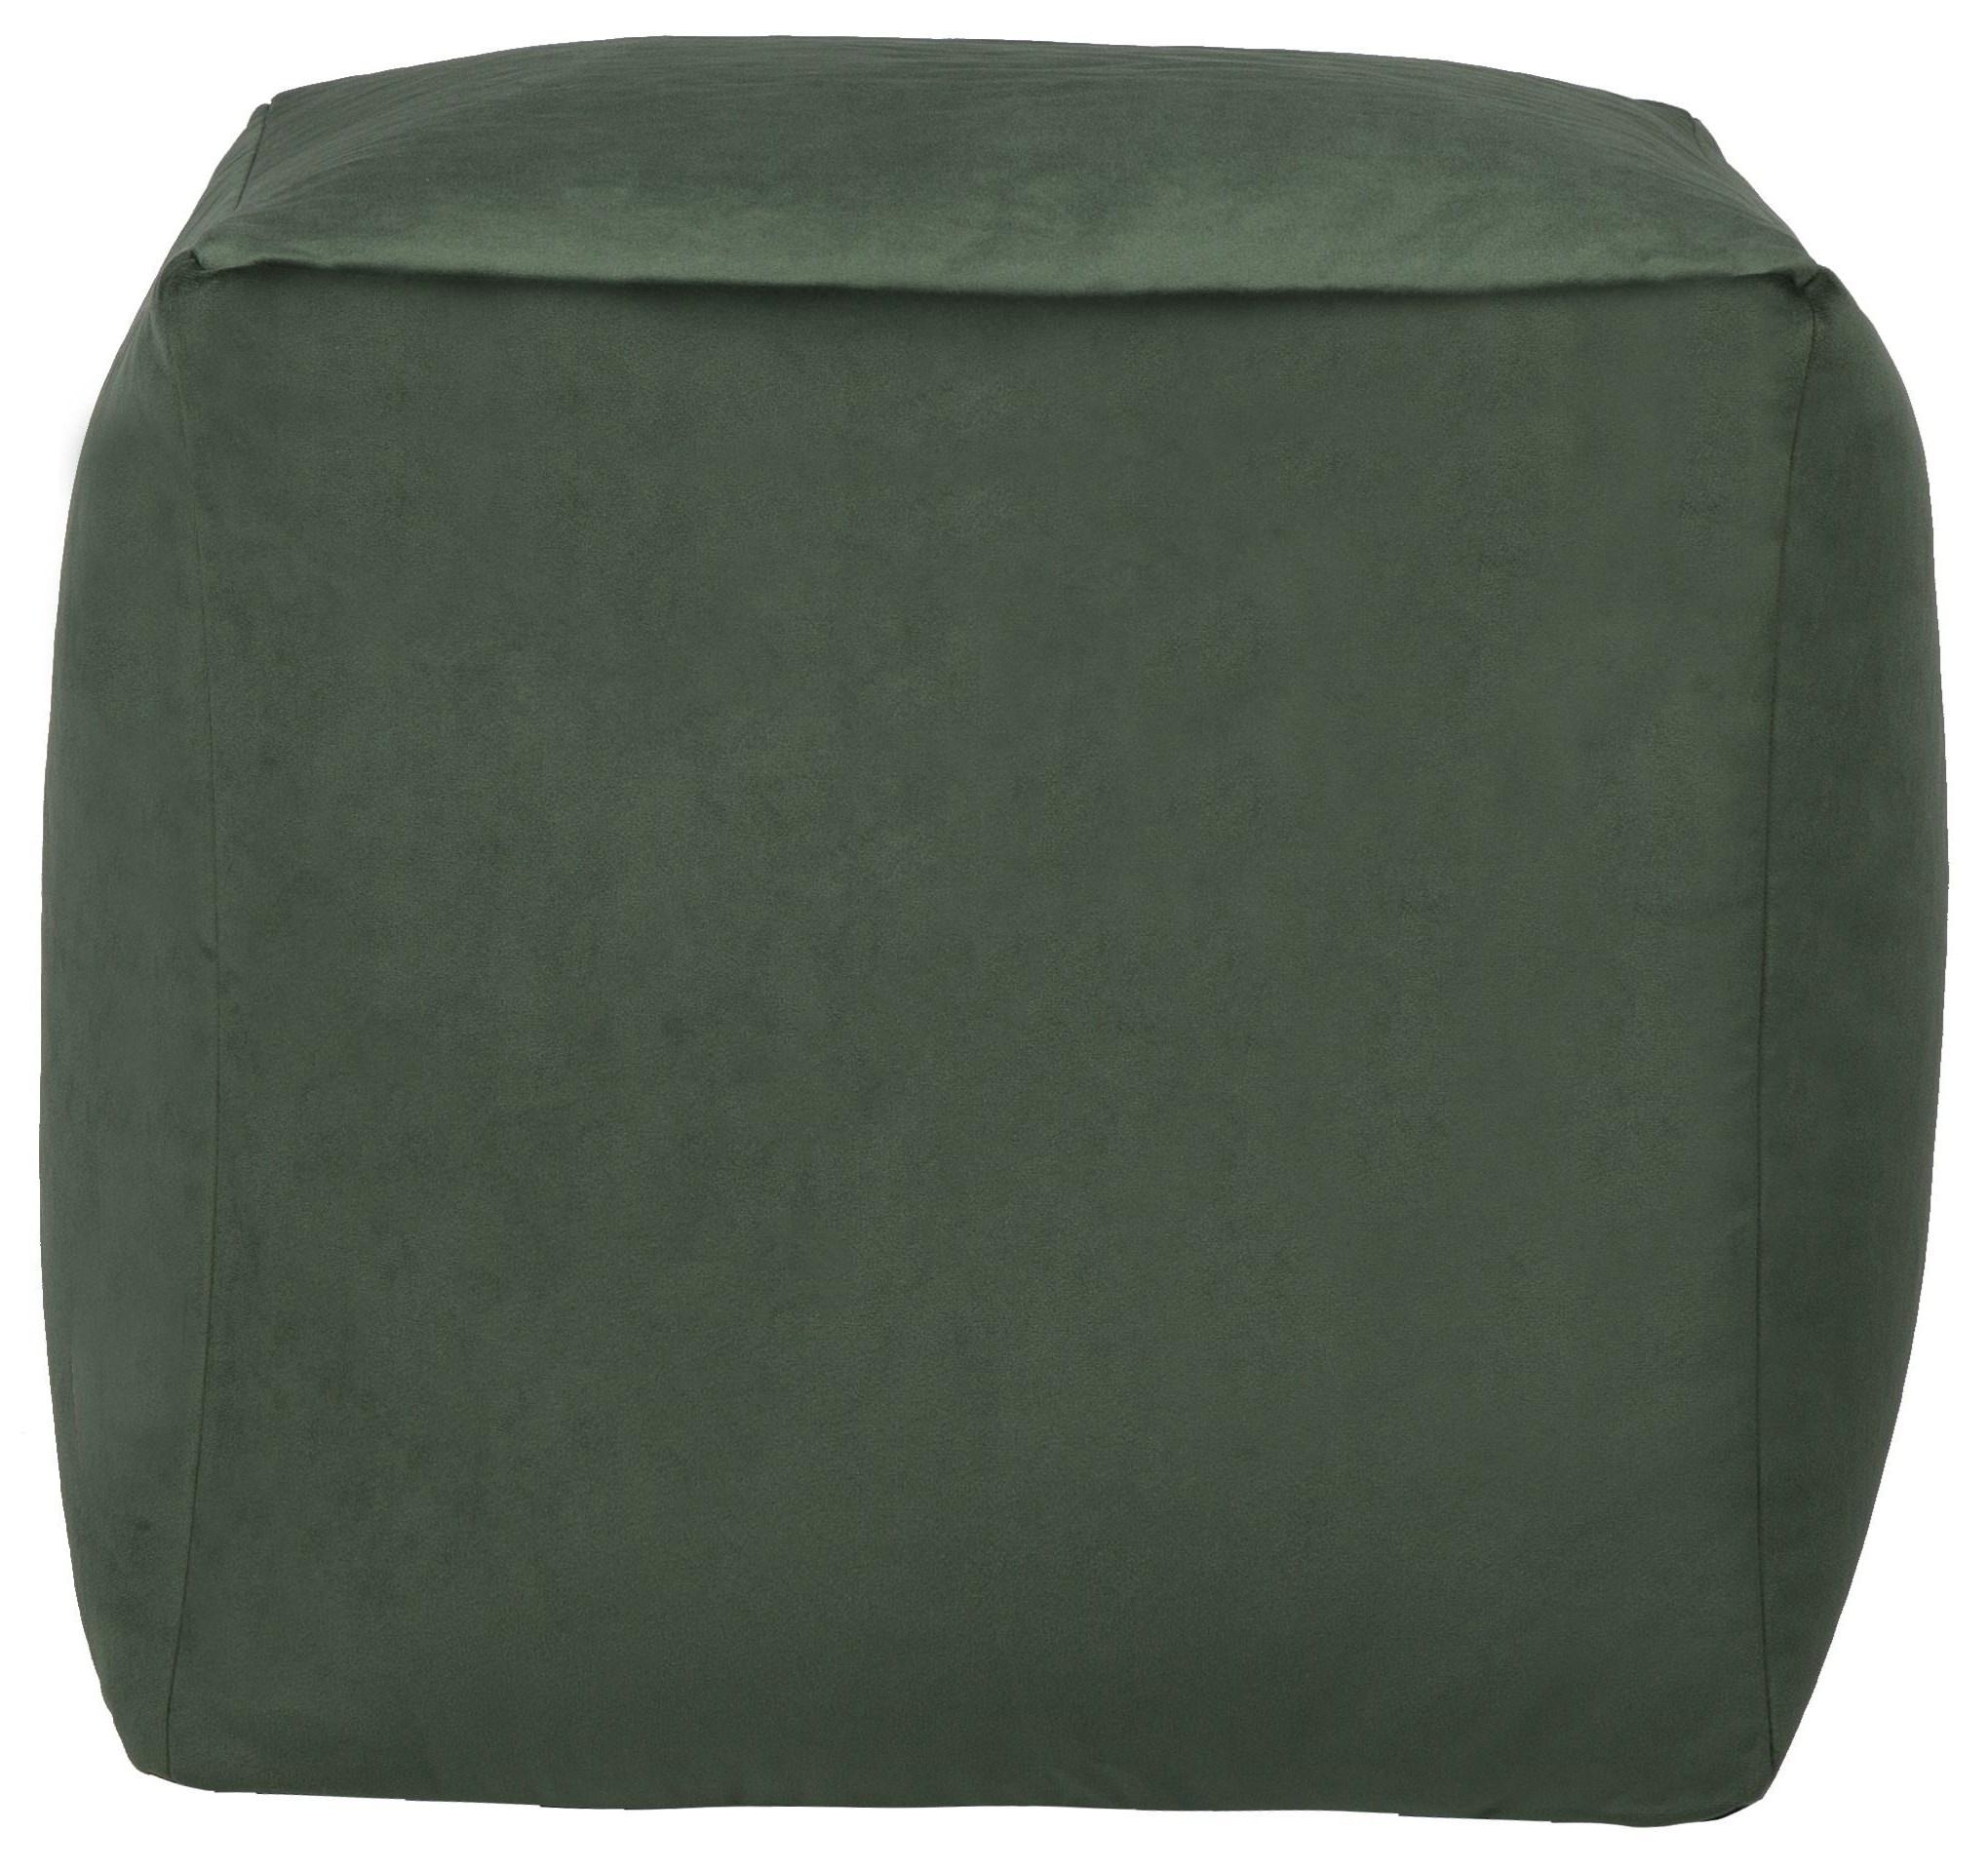 Green Cube Beanbag